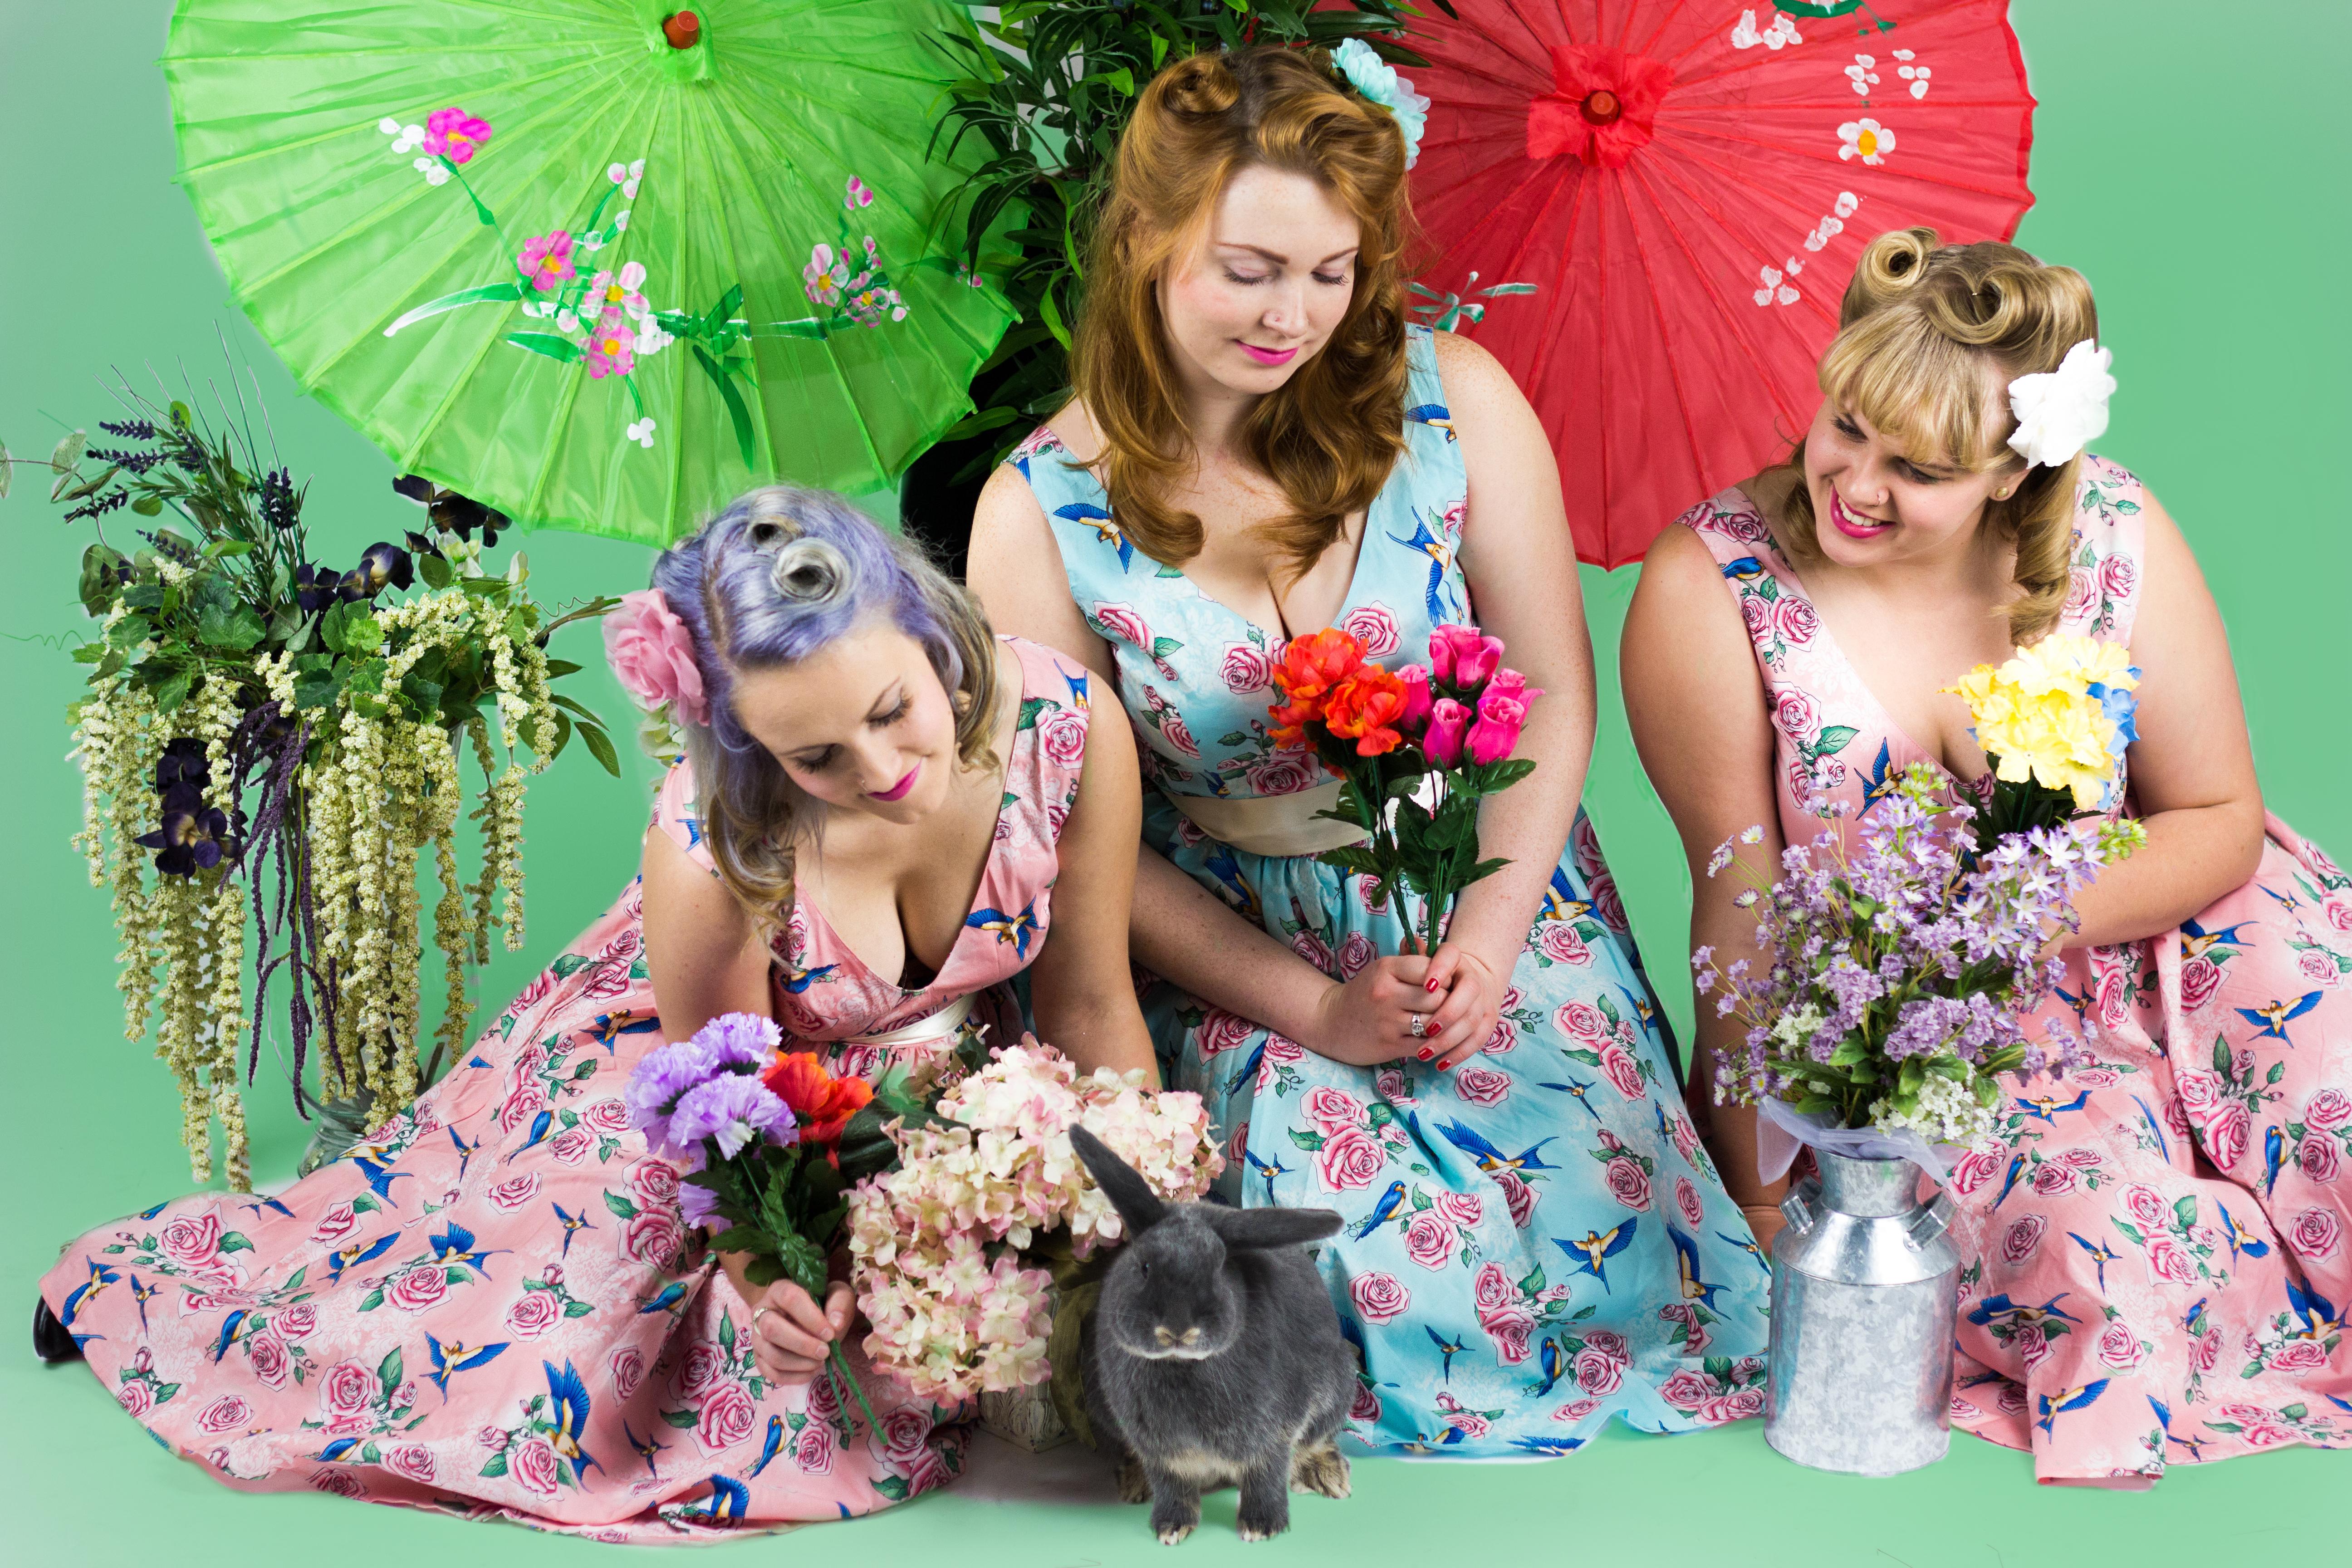 Jivin' Belles May 1